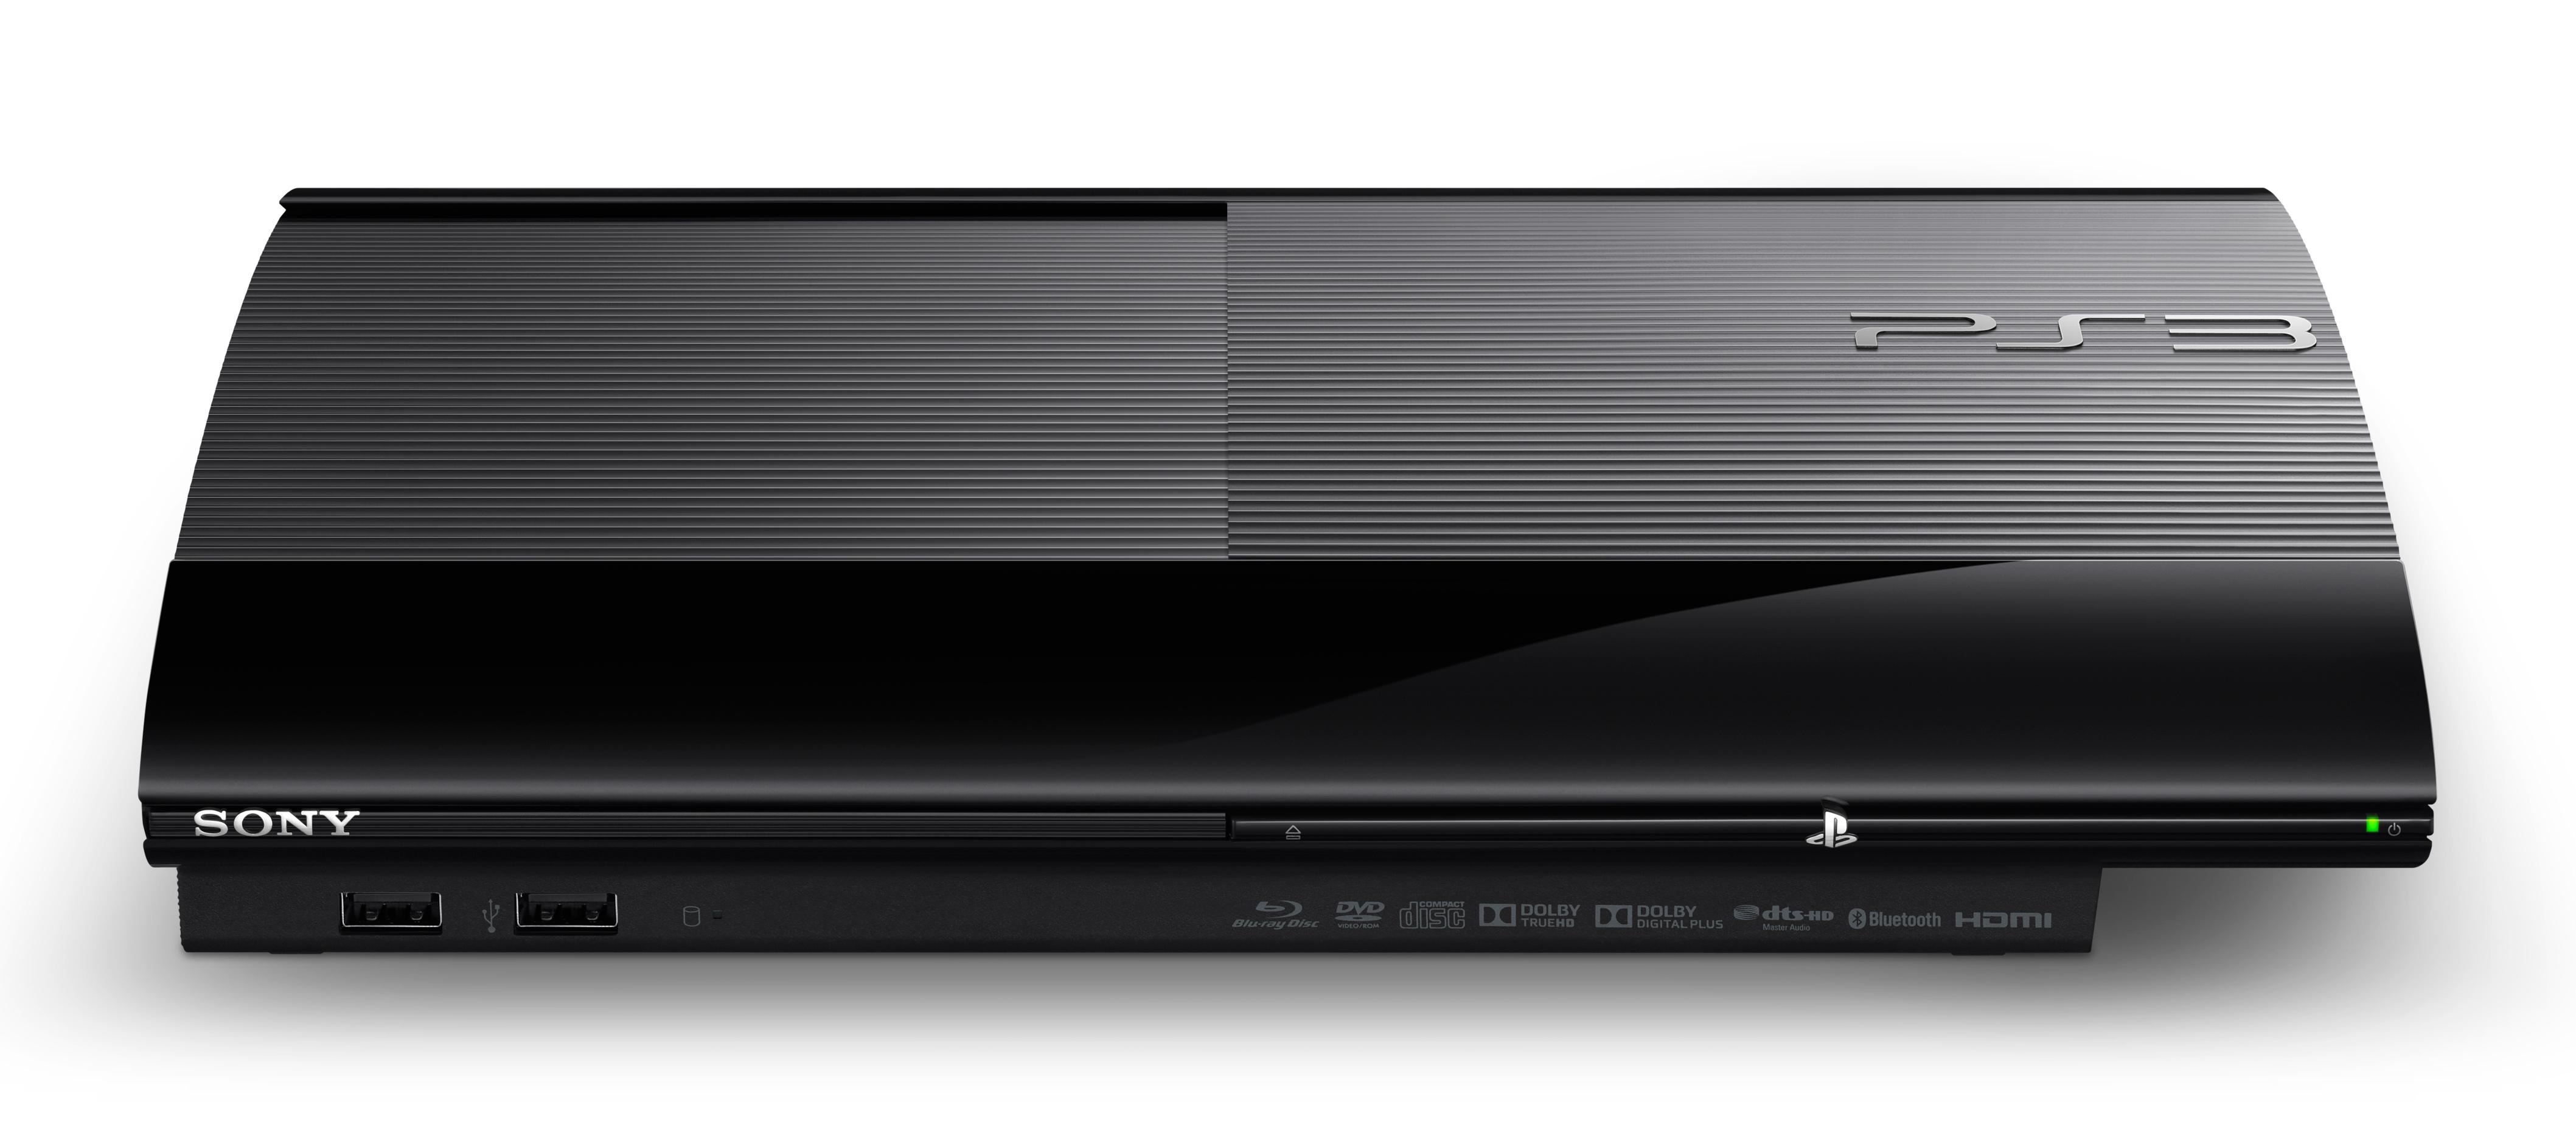 [Tokyo Game Show 2012] SONY anuncia novo modelo menor e mais leve do PS3: 8001375055_f3d6967a12_o